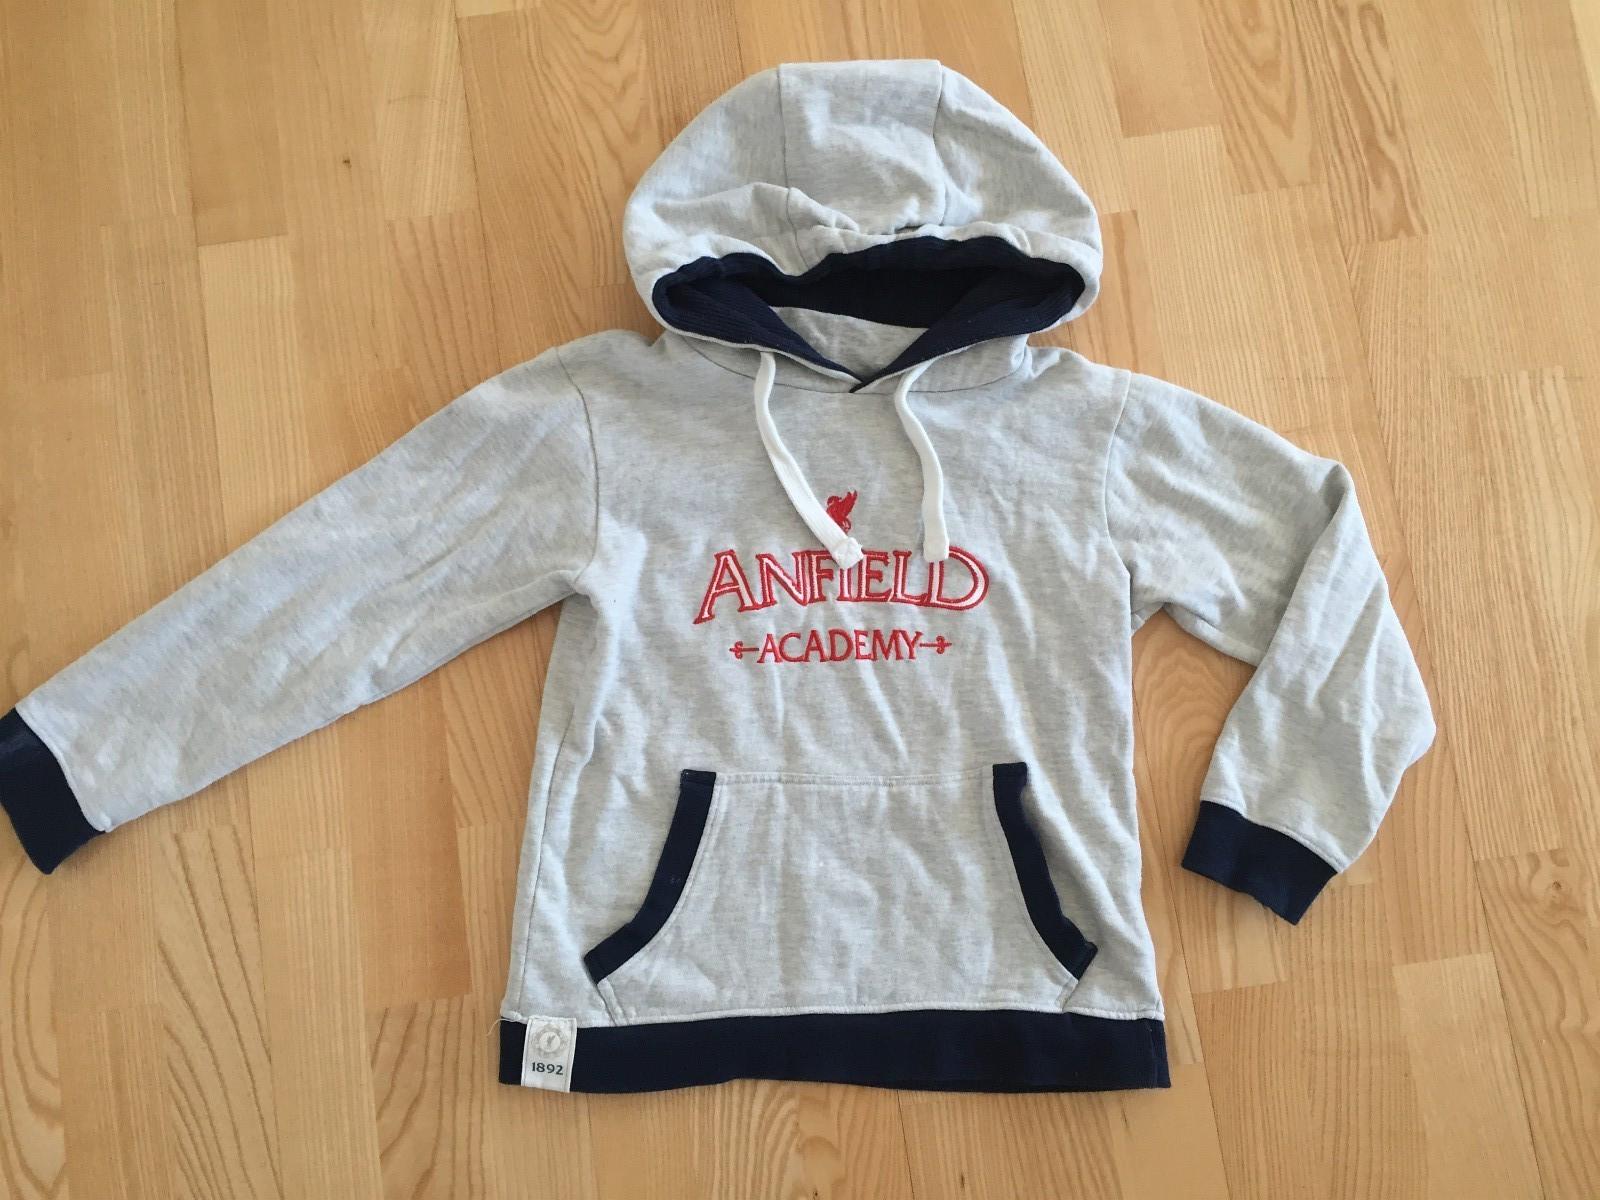 Liverpool-genser str 7-8 år - Drammen  - Liverpool-fan? Da er denne genseren helt topp